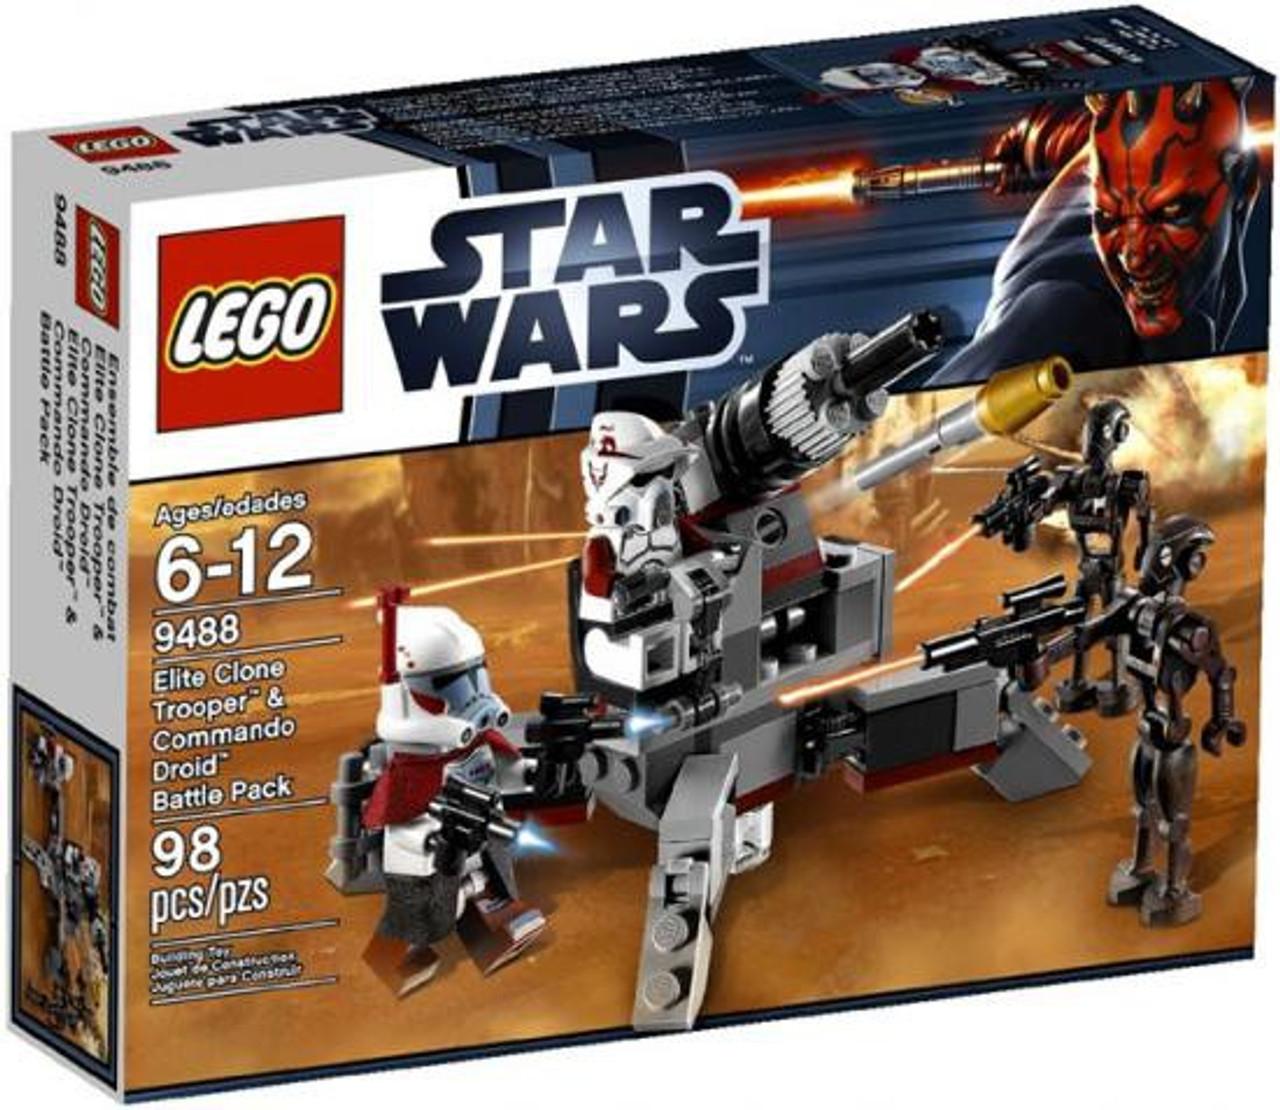 LEGO Star Wars The Clone Wars Elite Clone Trooper & Commando Droid Battle Pack Set #9488